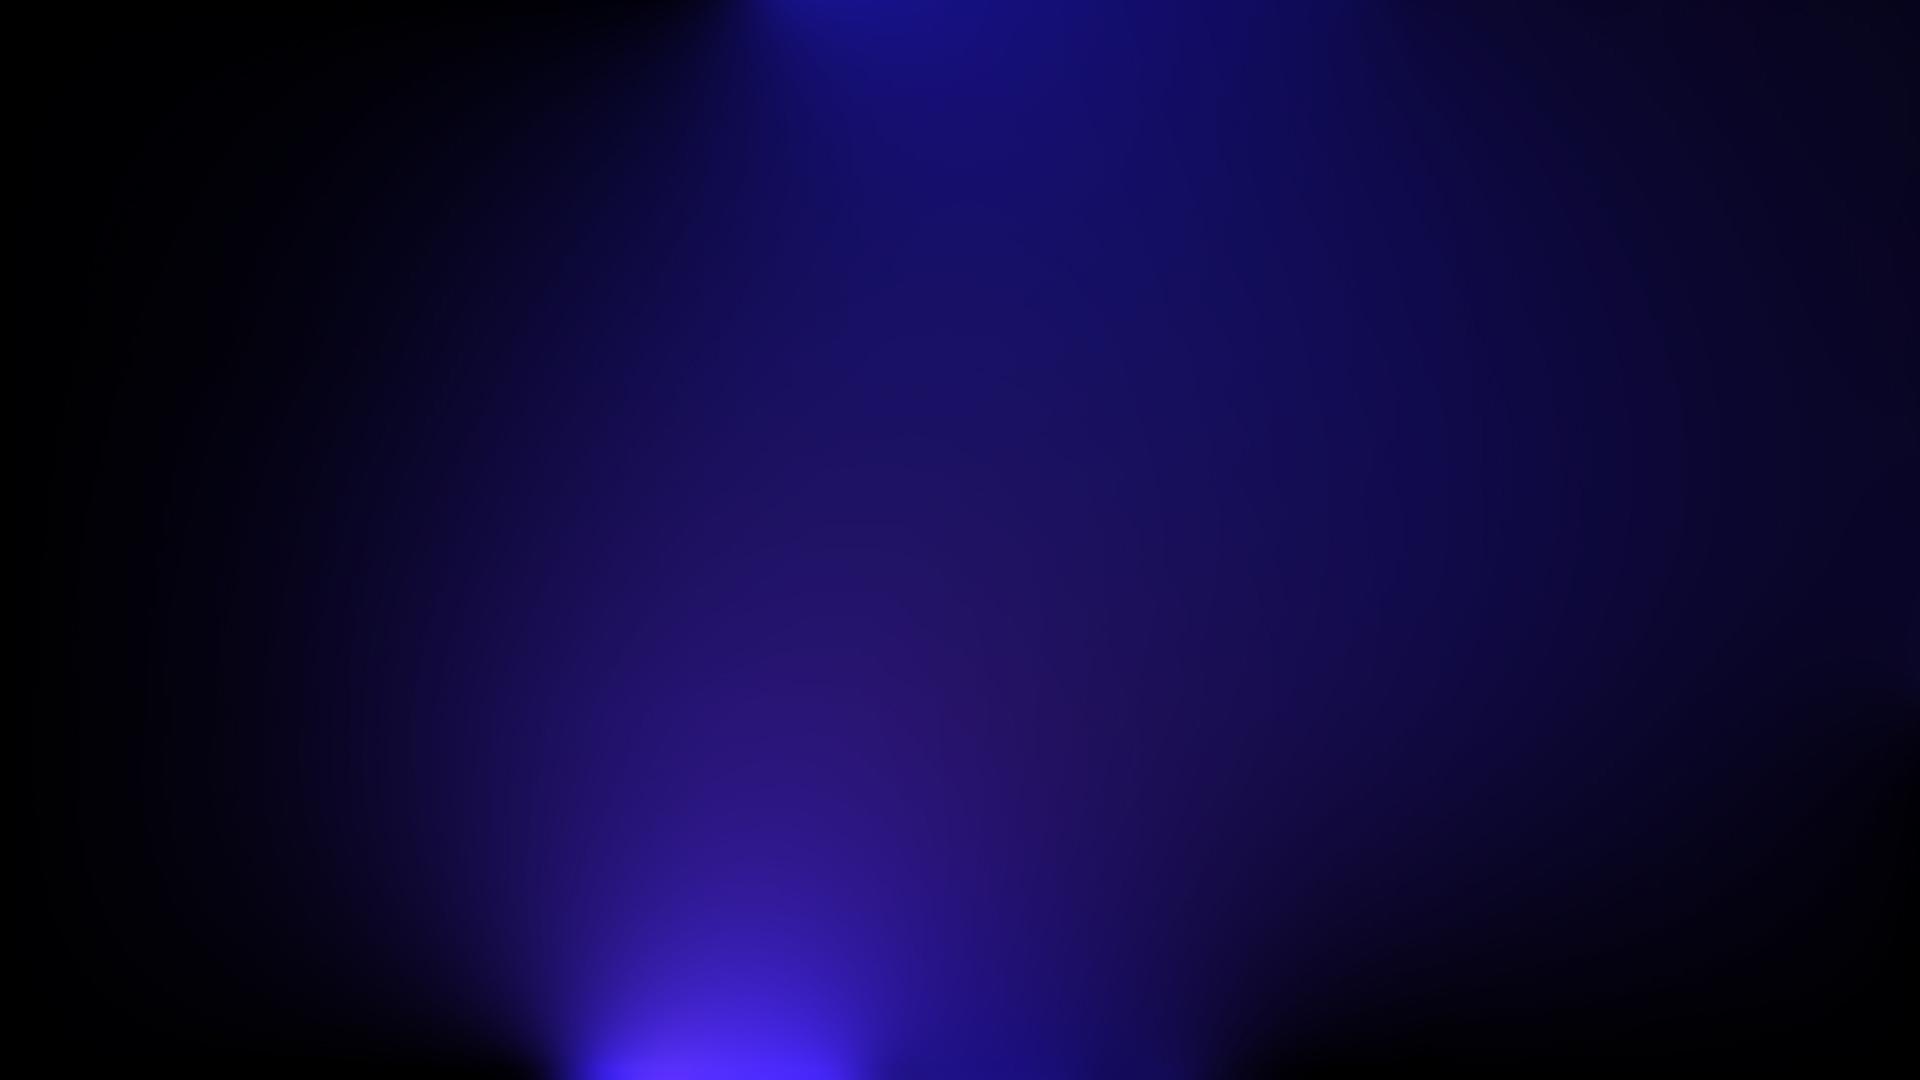 Dark-Blue-Full-HD-for-Background-1920x1080-px-KB-wallpaper-wpc5803934